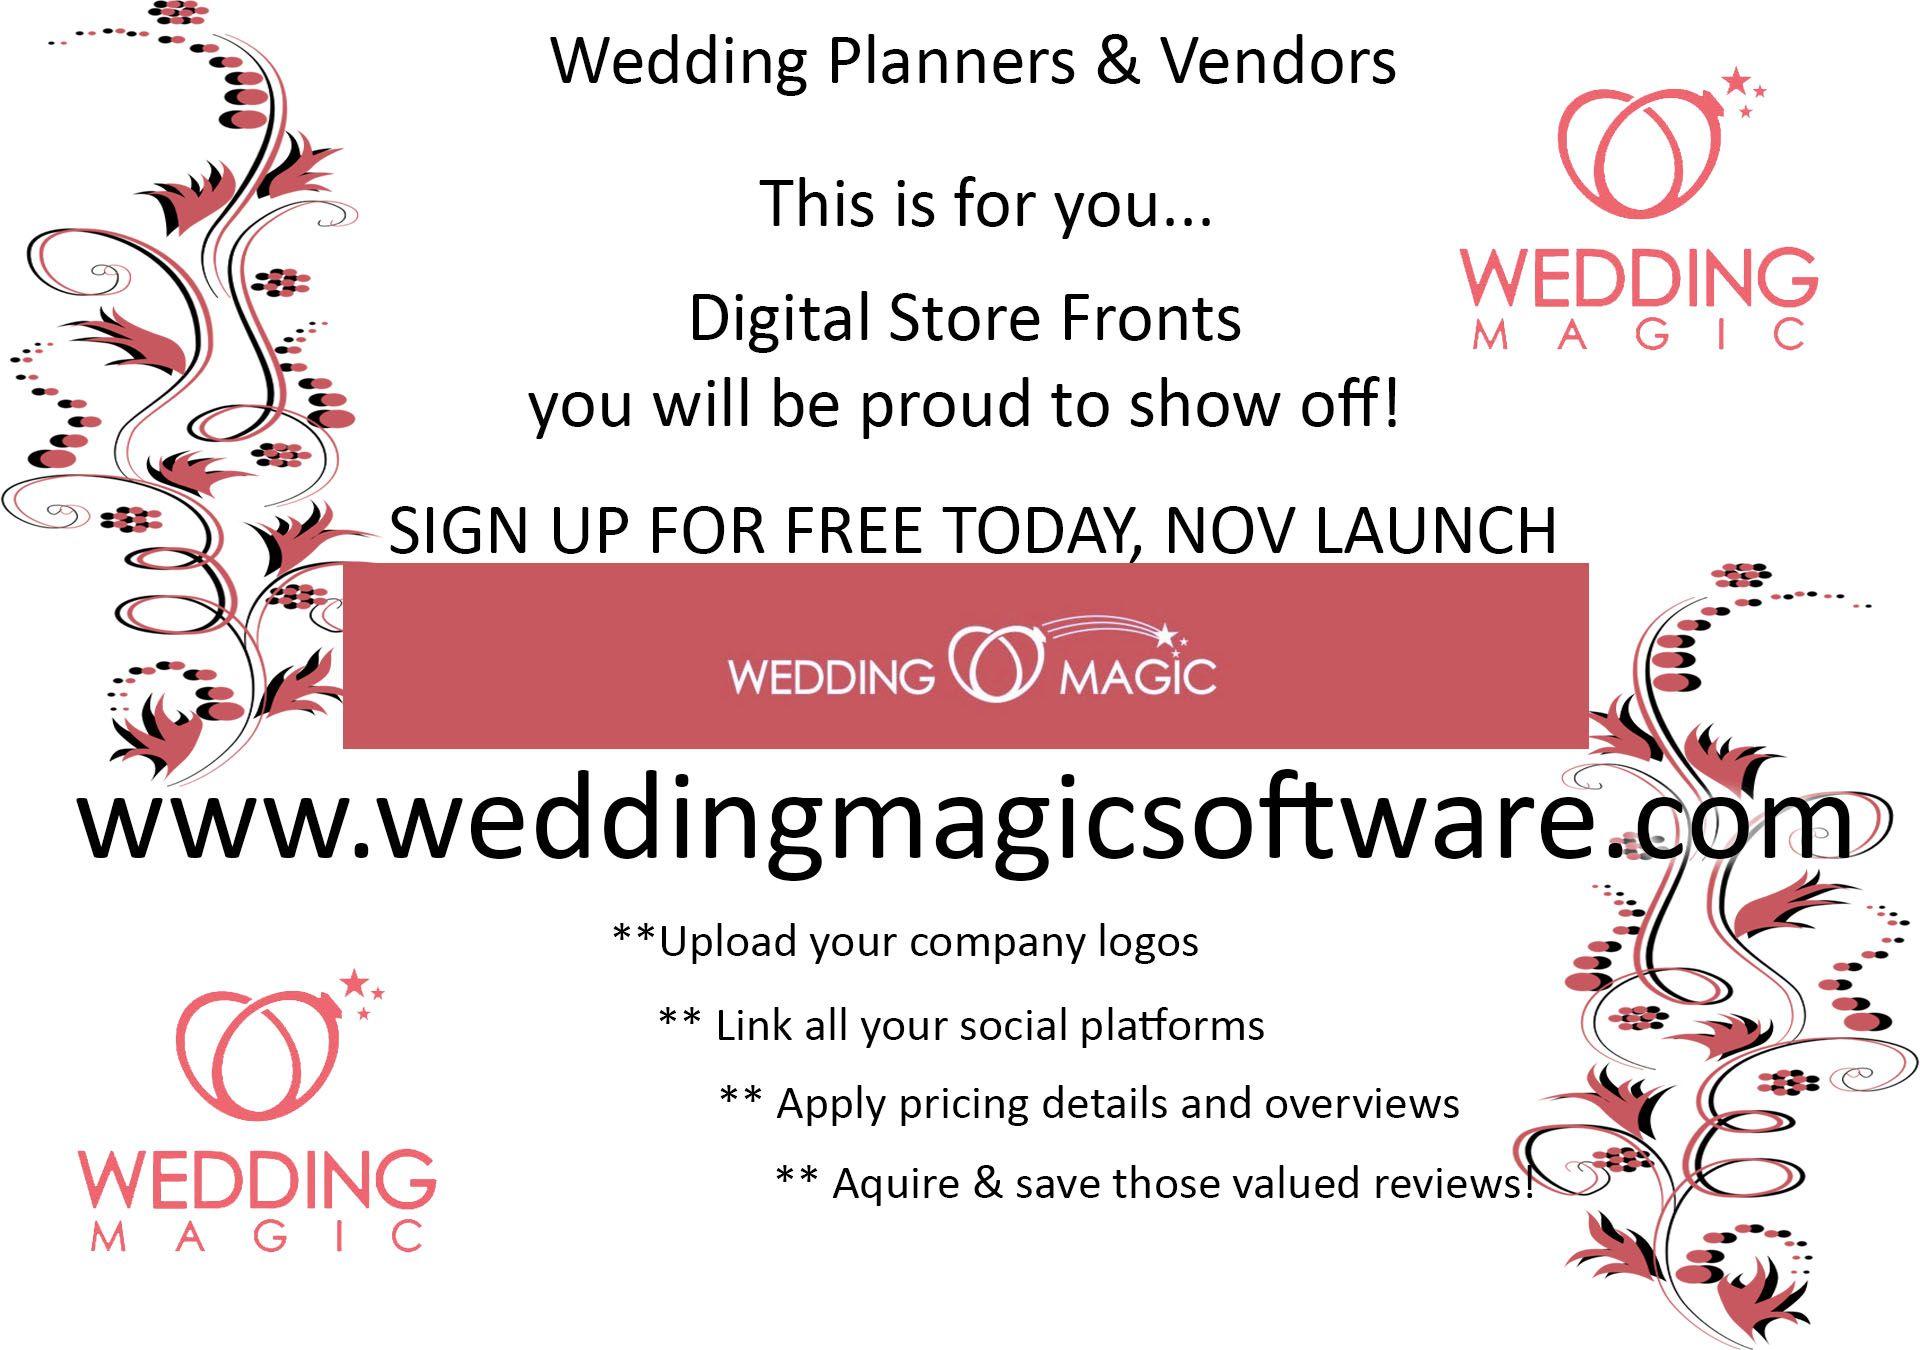 Wedding Planner, Event Vendors, Bride, Bridal, Wedding Party, Groom ...